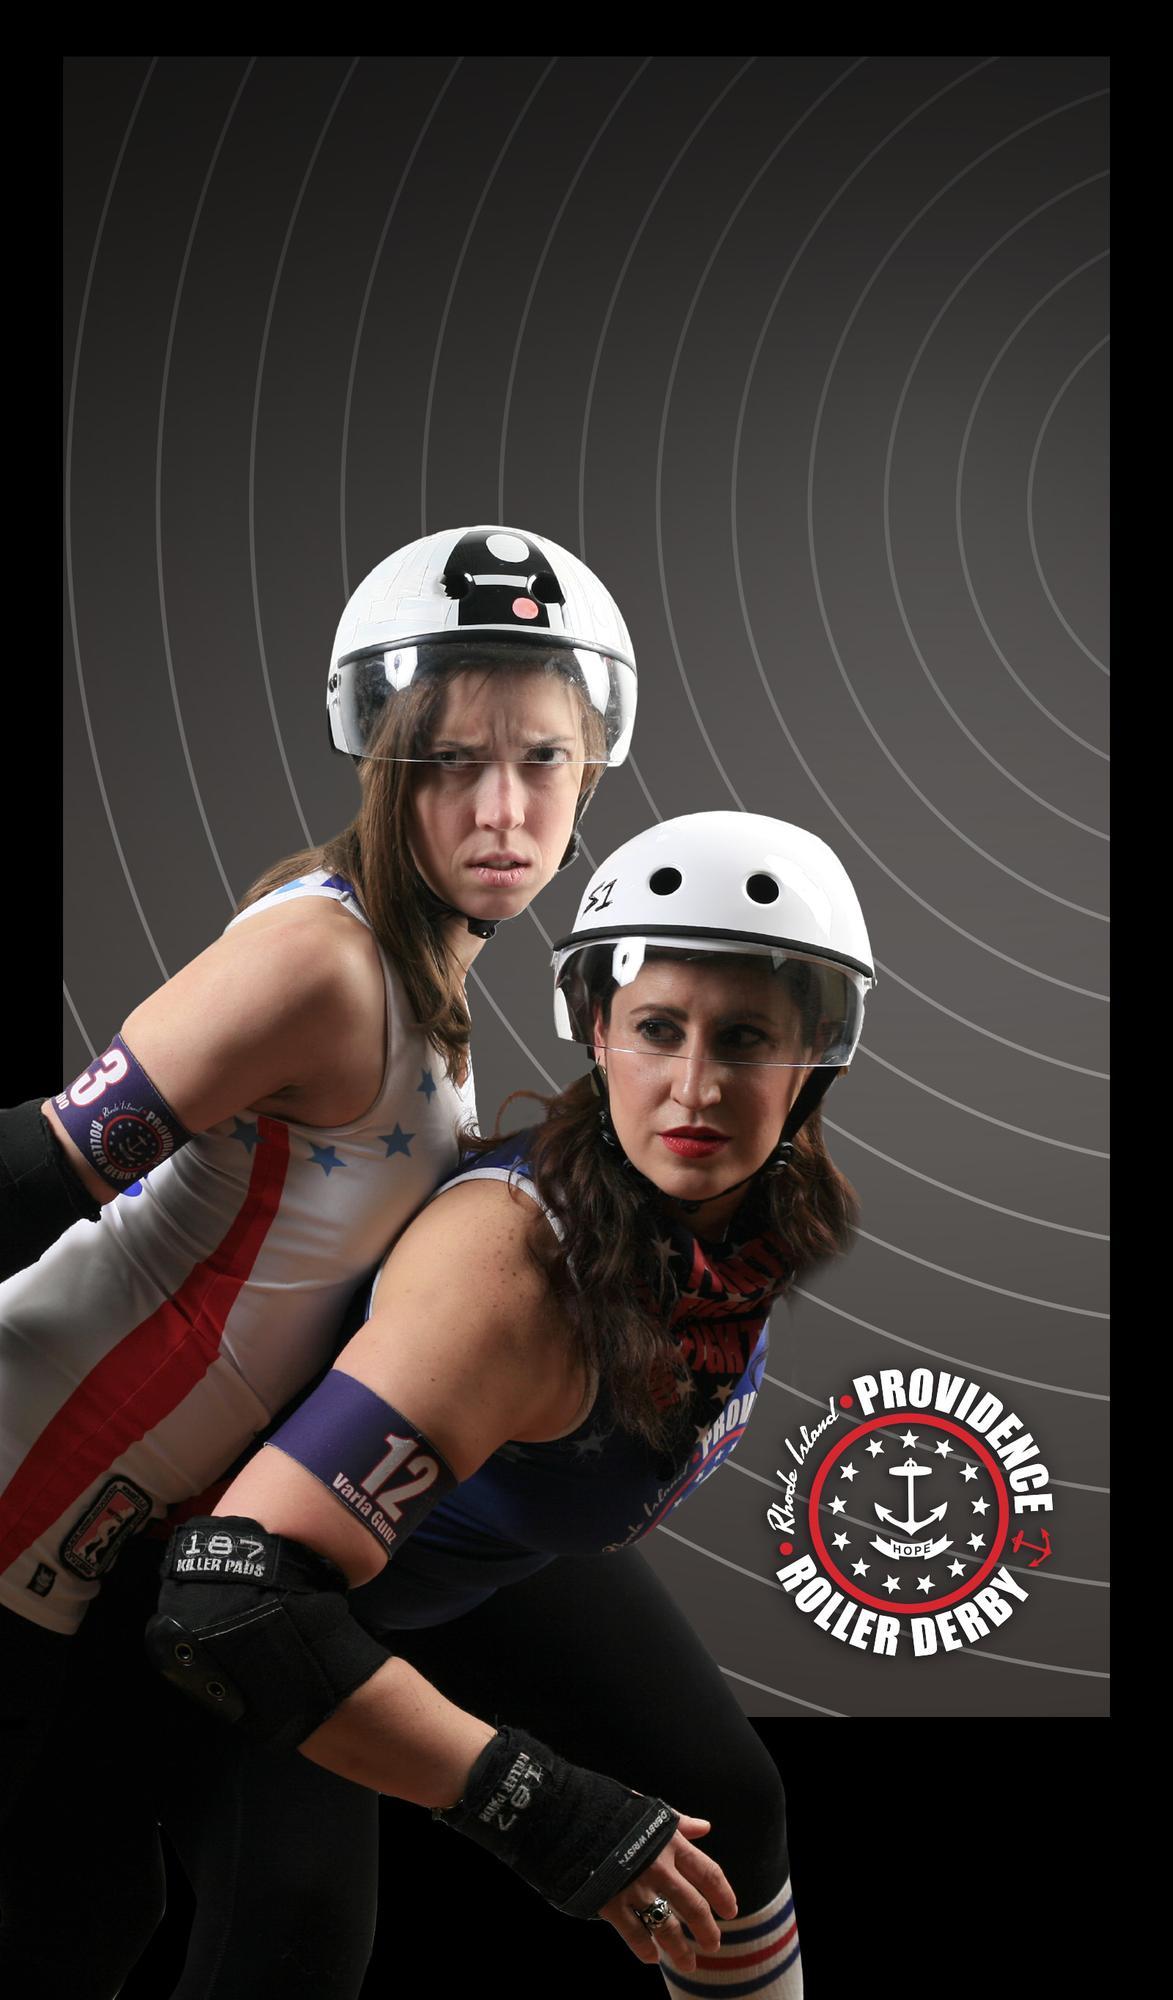 Roller skating quebec city - Providence Roller Derby Vs Lehigh Valley Rollergirls